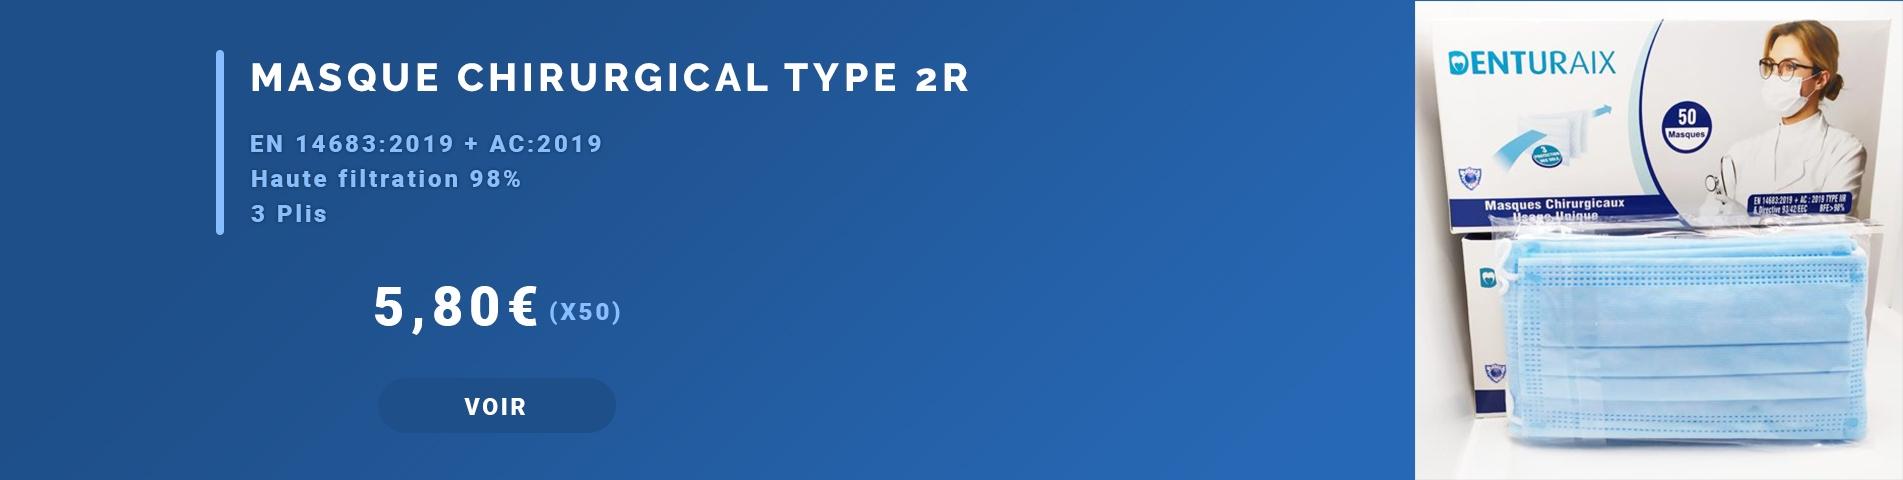 Masque Chirurgical 3 Plis Type 2 R (Boite De 50)